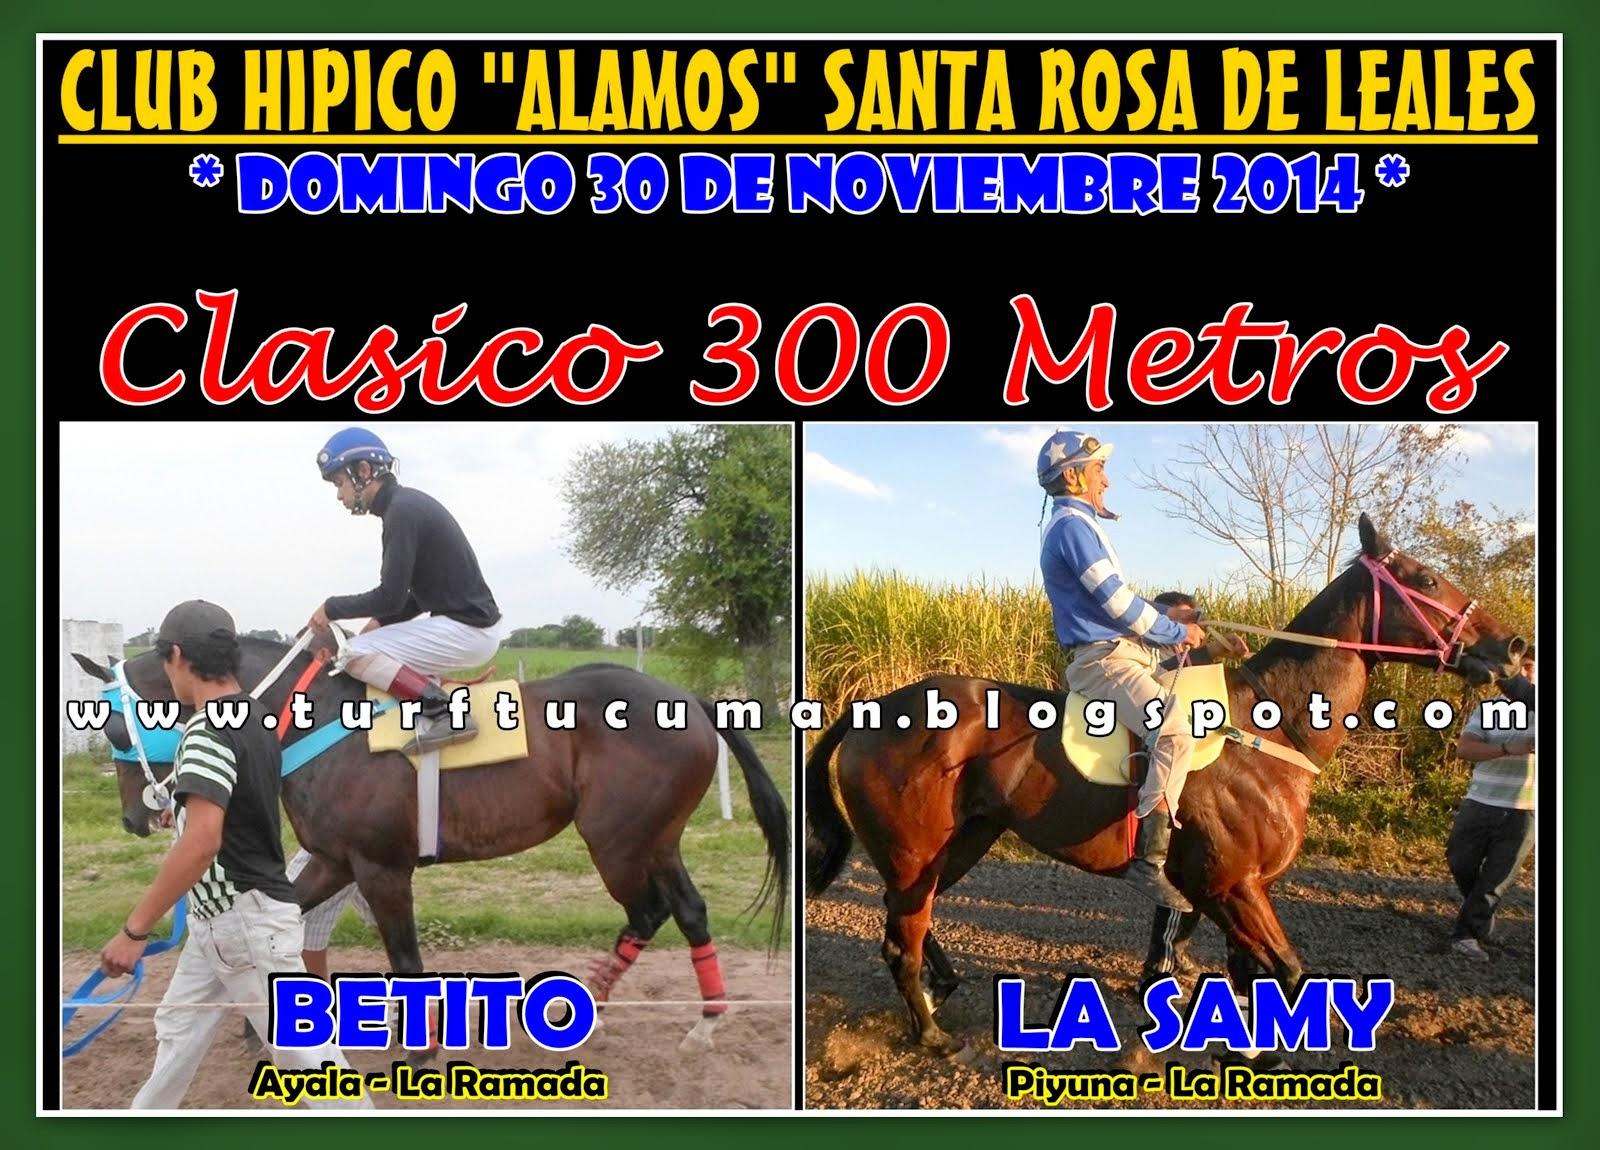 BETITO VS SAMY